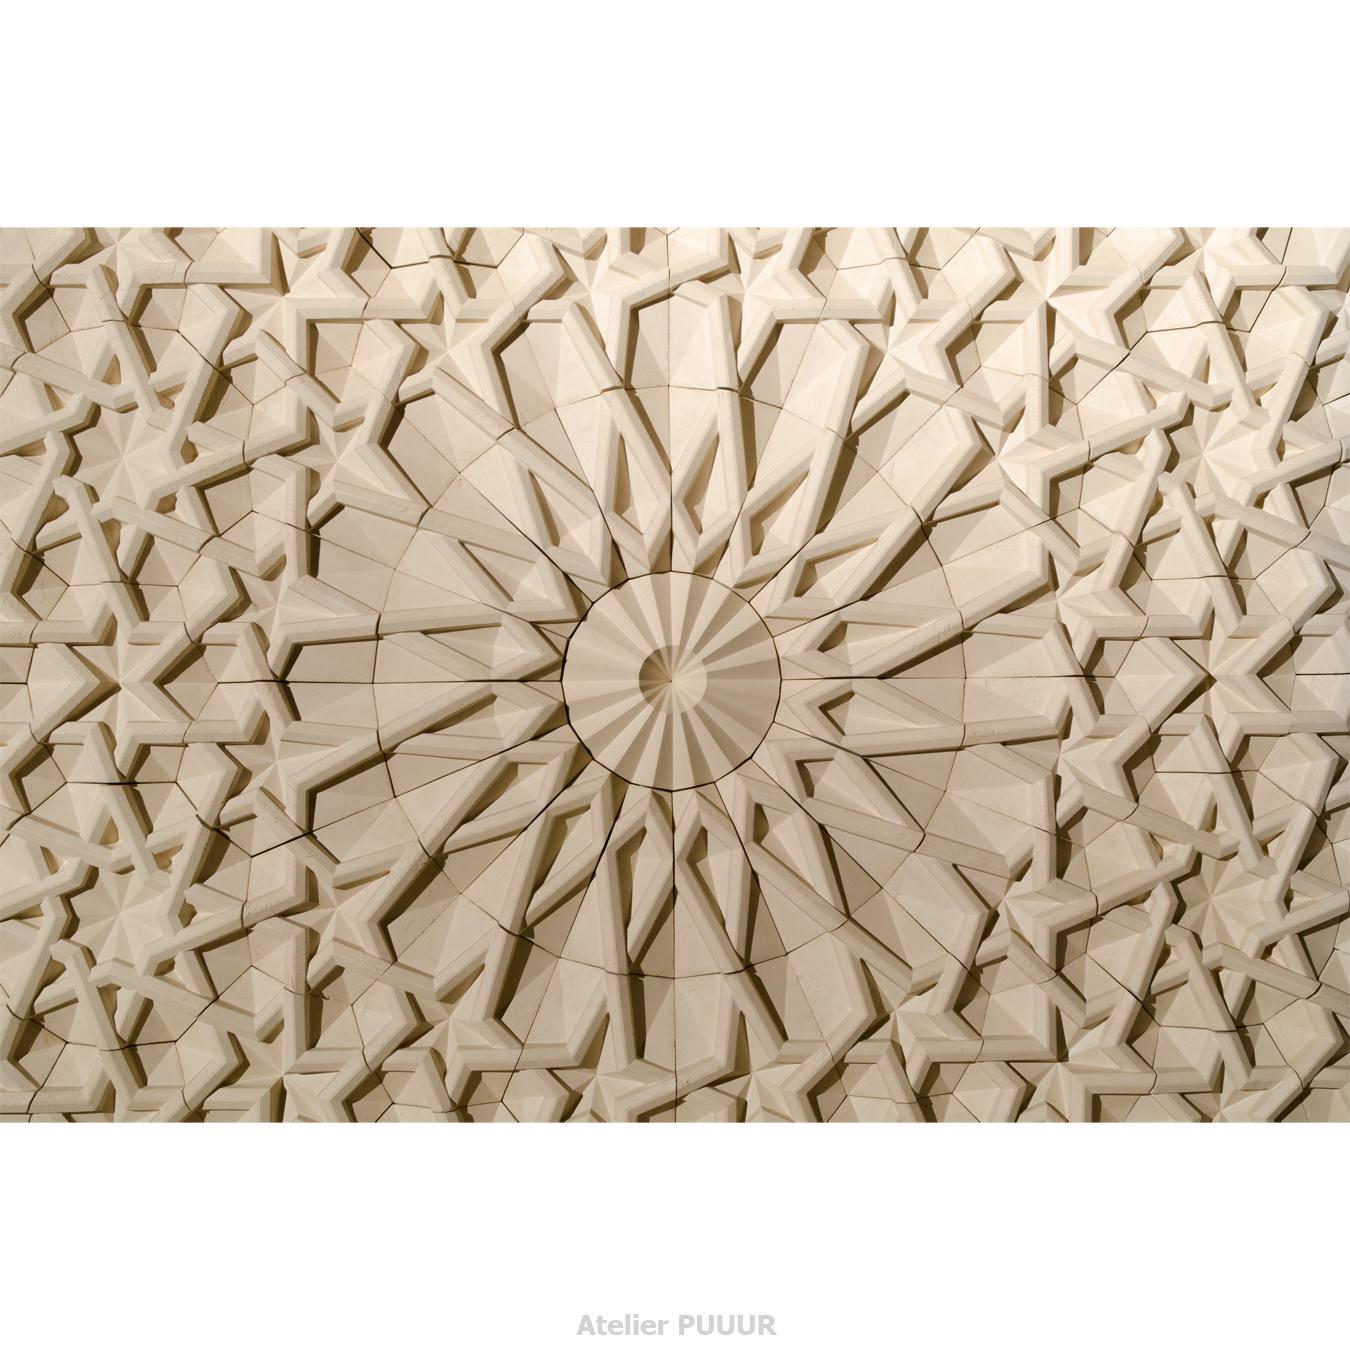 Islamic graveyard pavilion wall mosaic total Atelier PUUUR